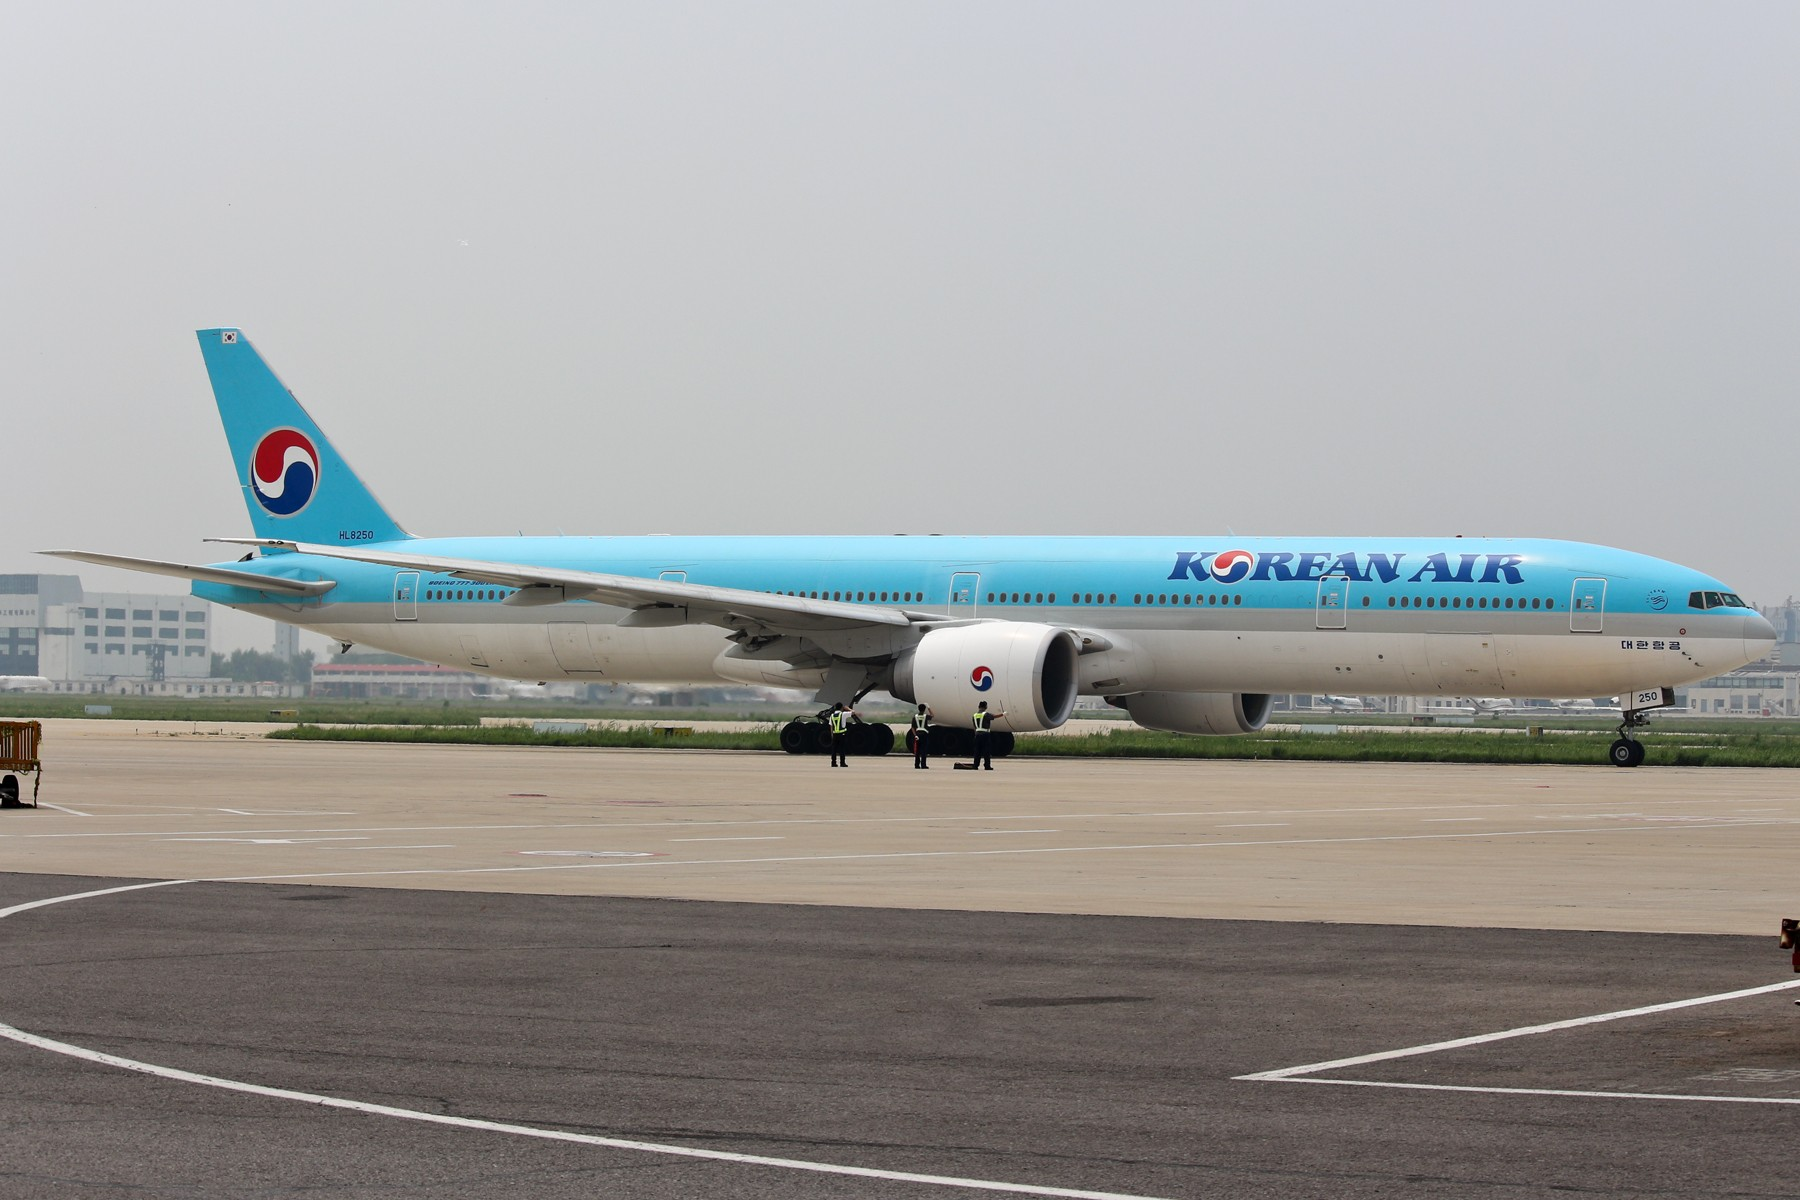 Re:[原创]【TSN飞友会】1800*1200 近期TSN集锦 不看绝对后悔 BOEING 777-300ER  中国天津滨海国际机场